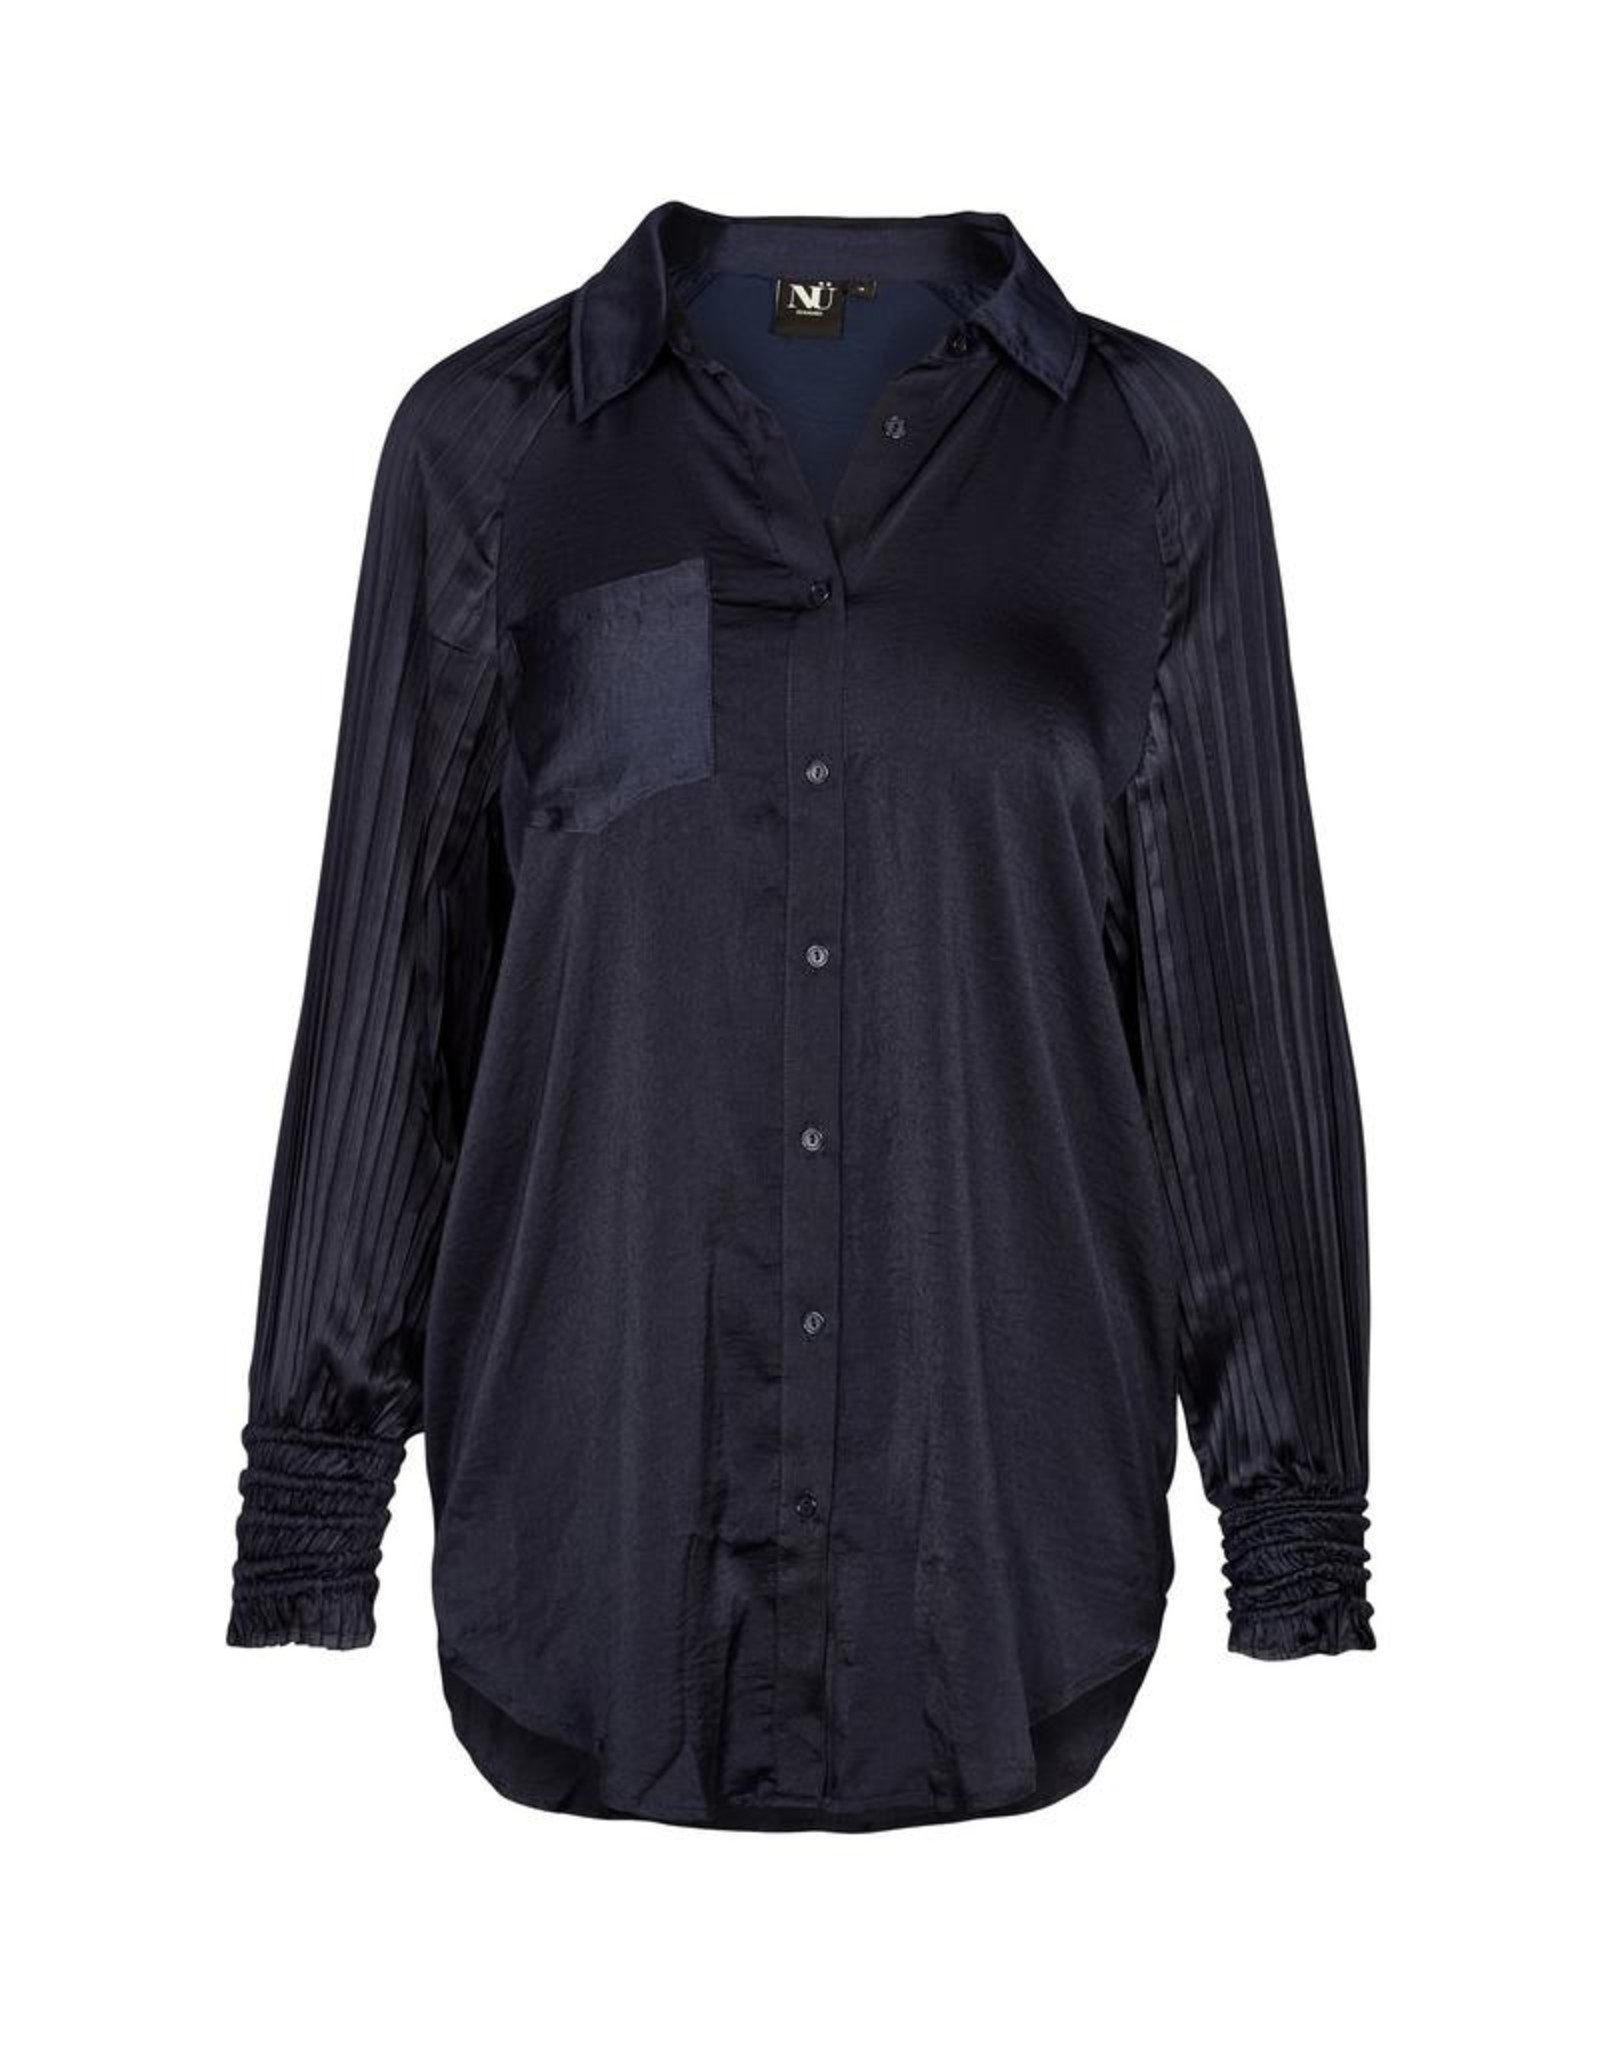 Nu Denmark Eun Recycled Shirt Midnight Blue